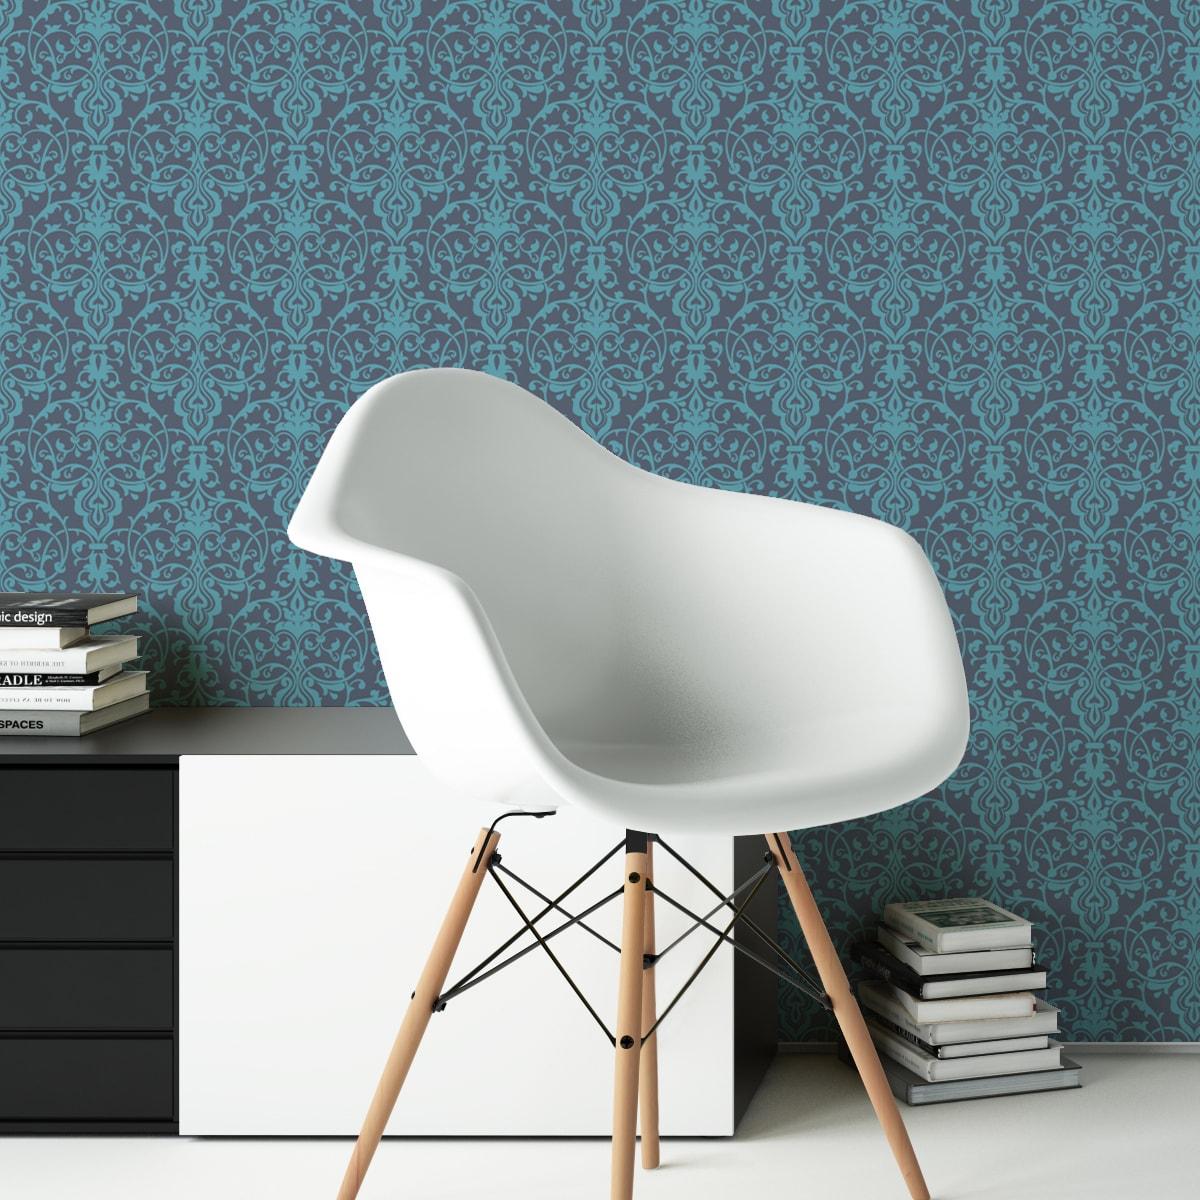 Wandtapete hellblau: Edle blaue Tapete mit klassischem Damast Muster angepasst an Little Greene Wandfarben- Vliestapete Ornamente